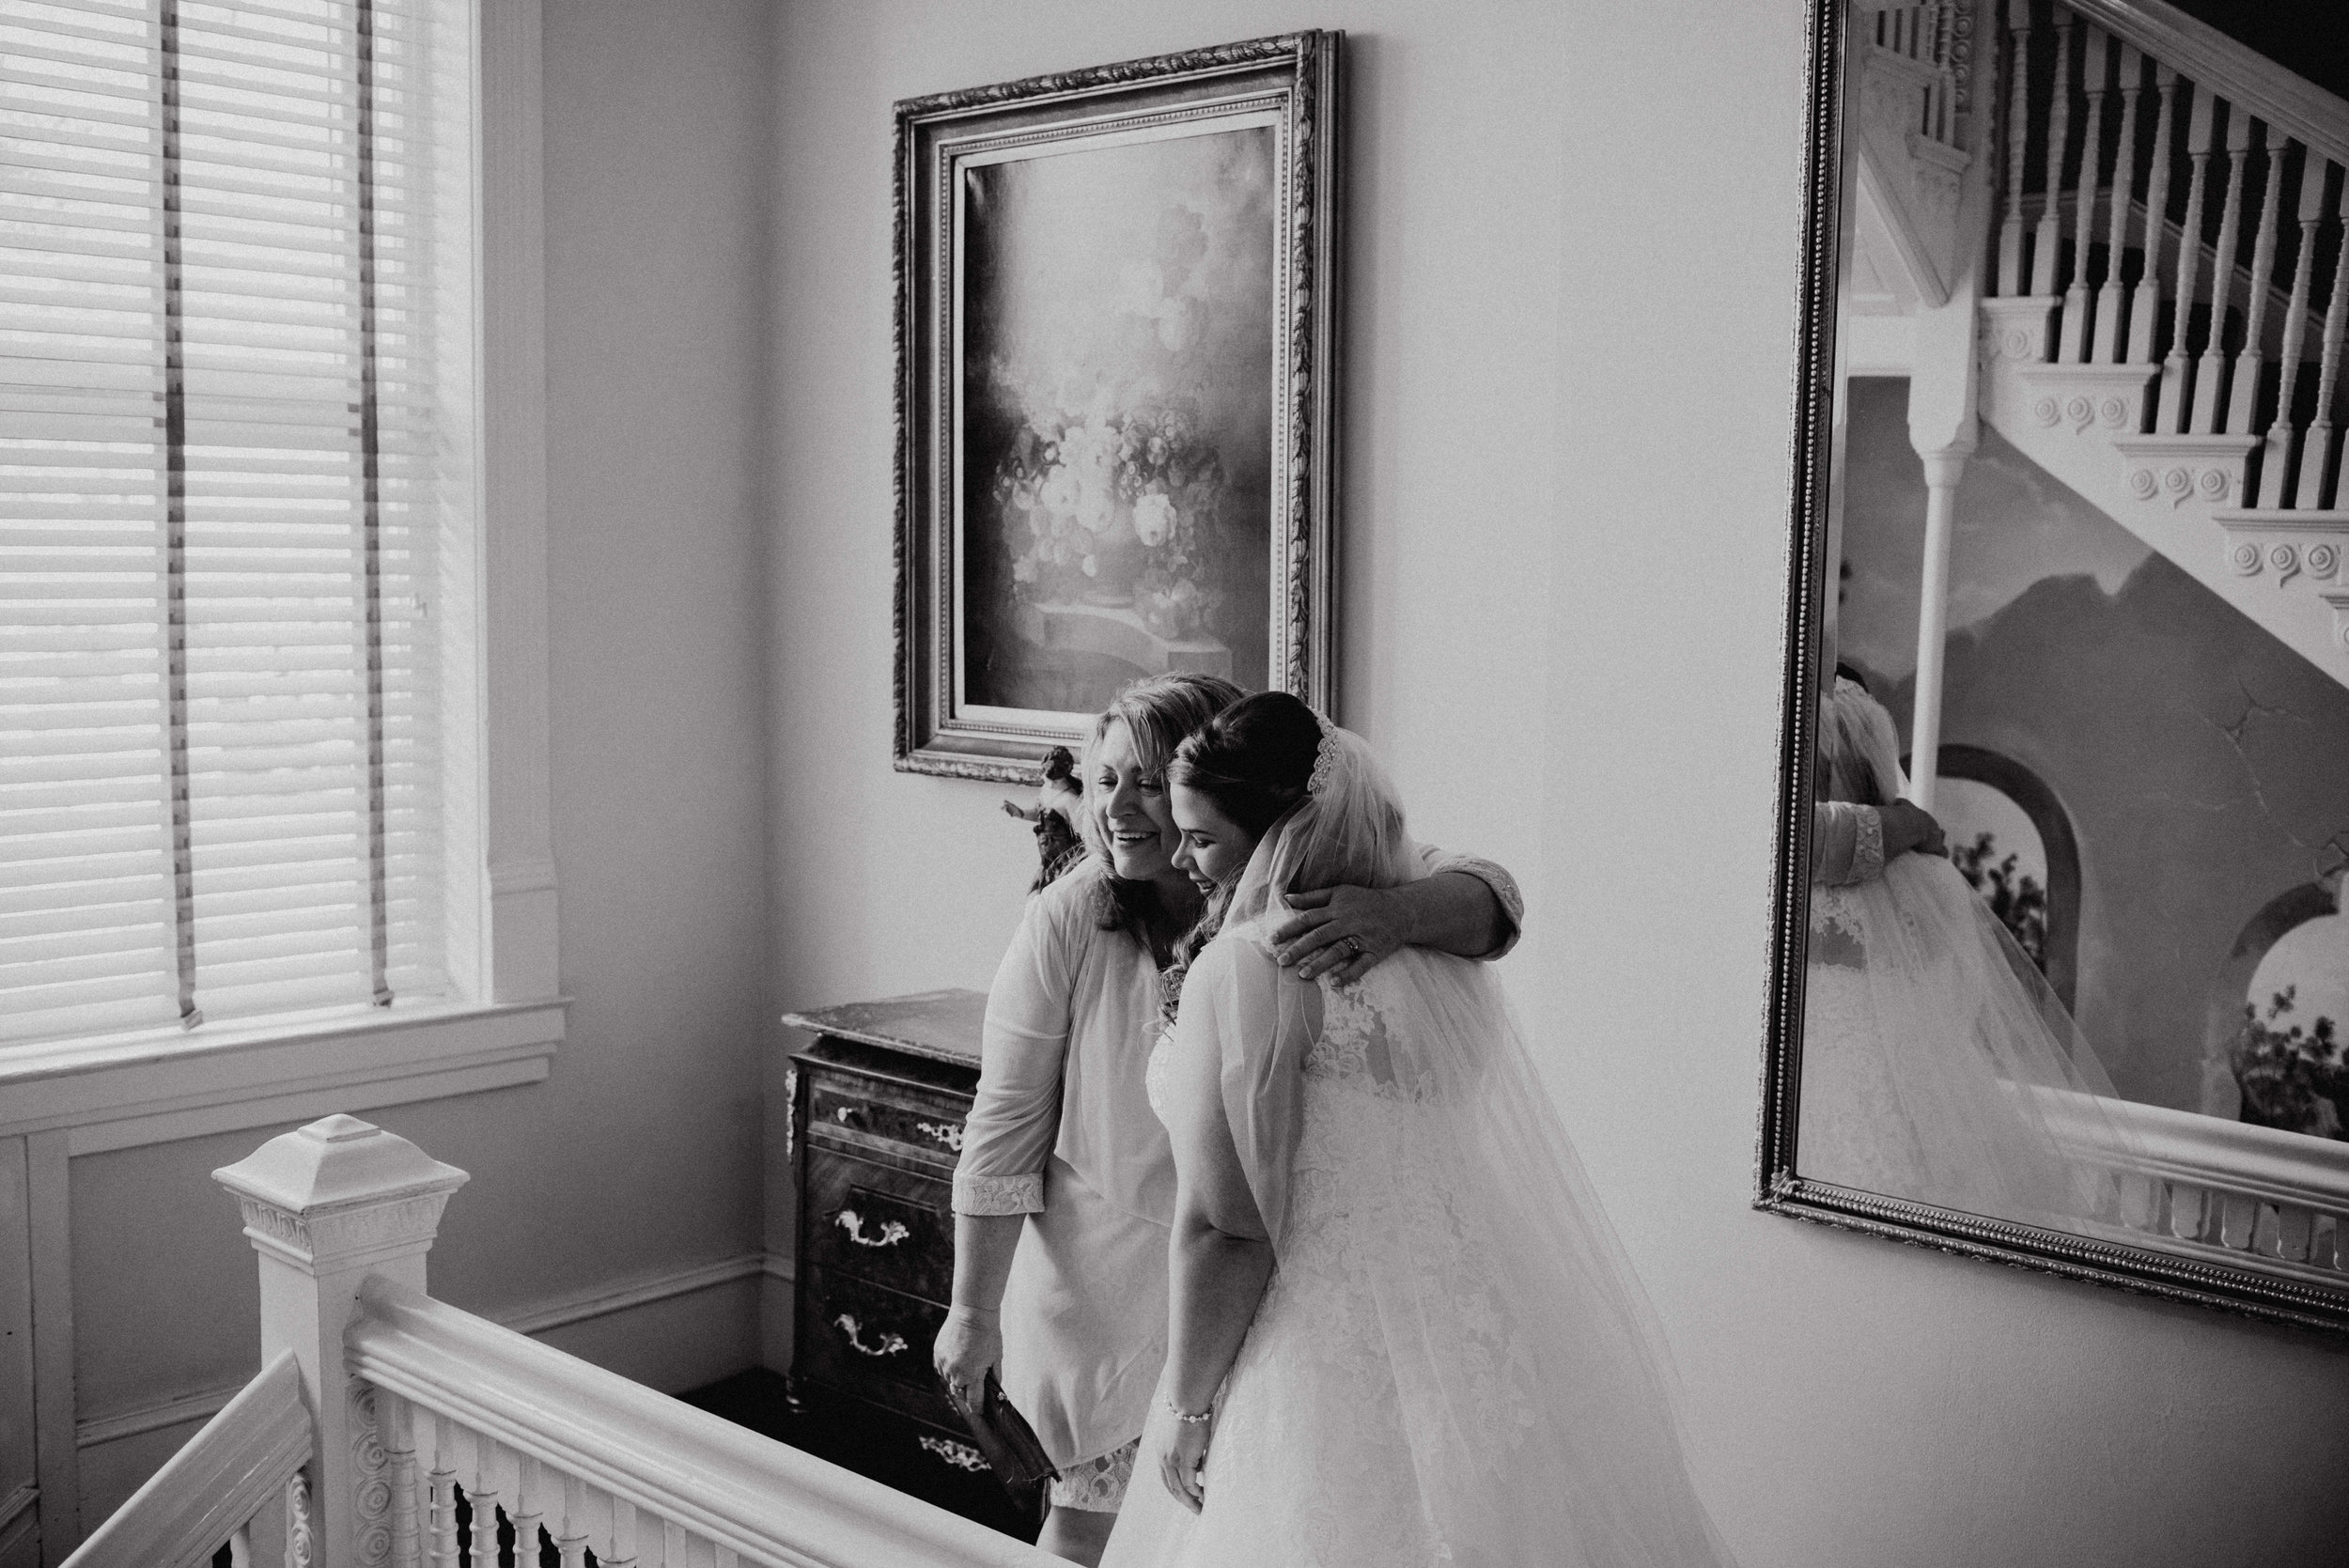 WonderlyCreative_Wedding_5.12.18_Megan&Swapnil_-387aa13.jpg